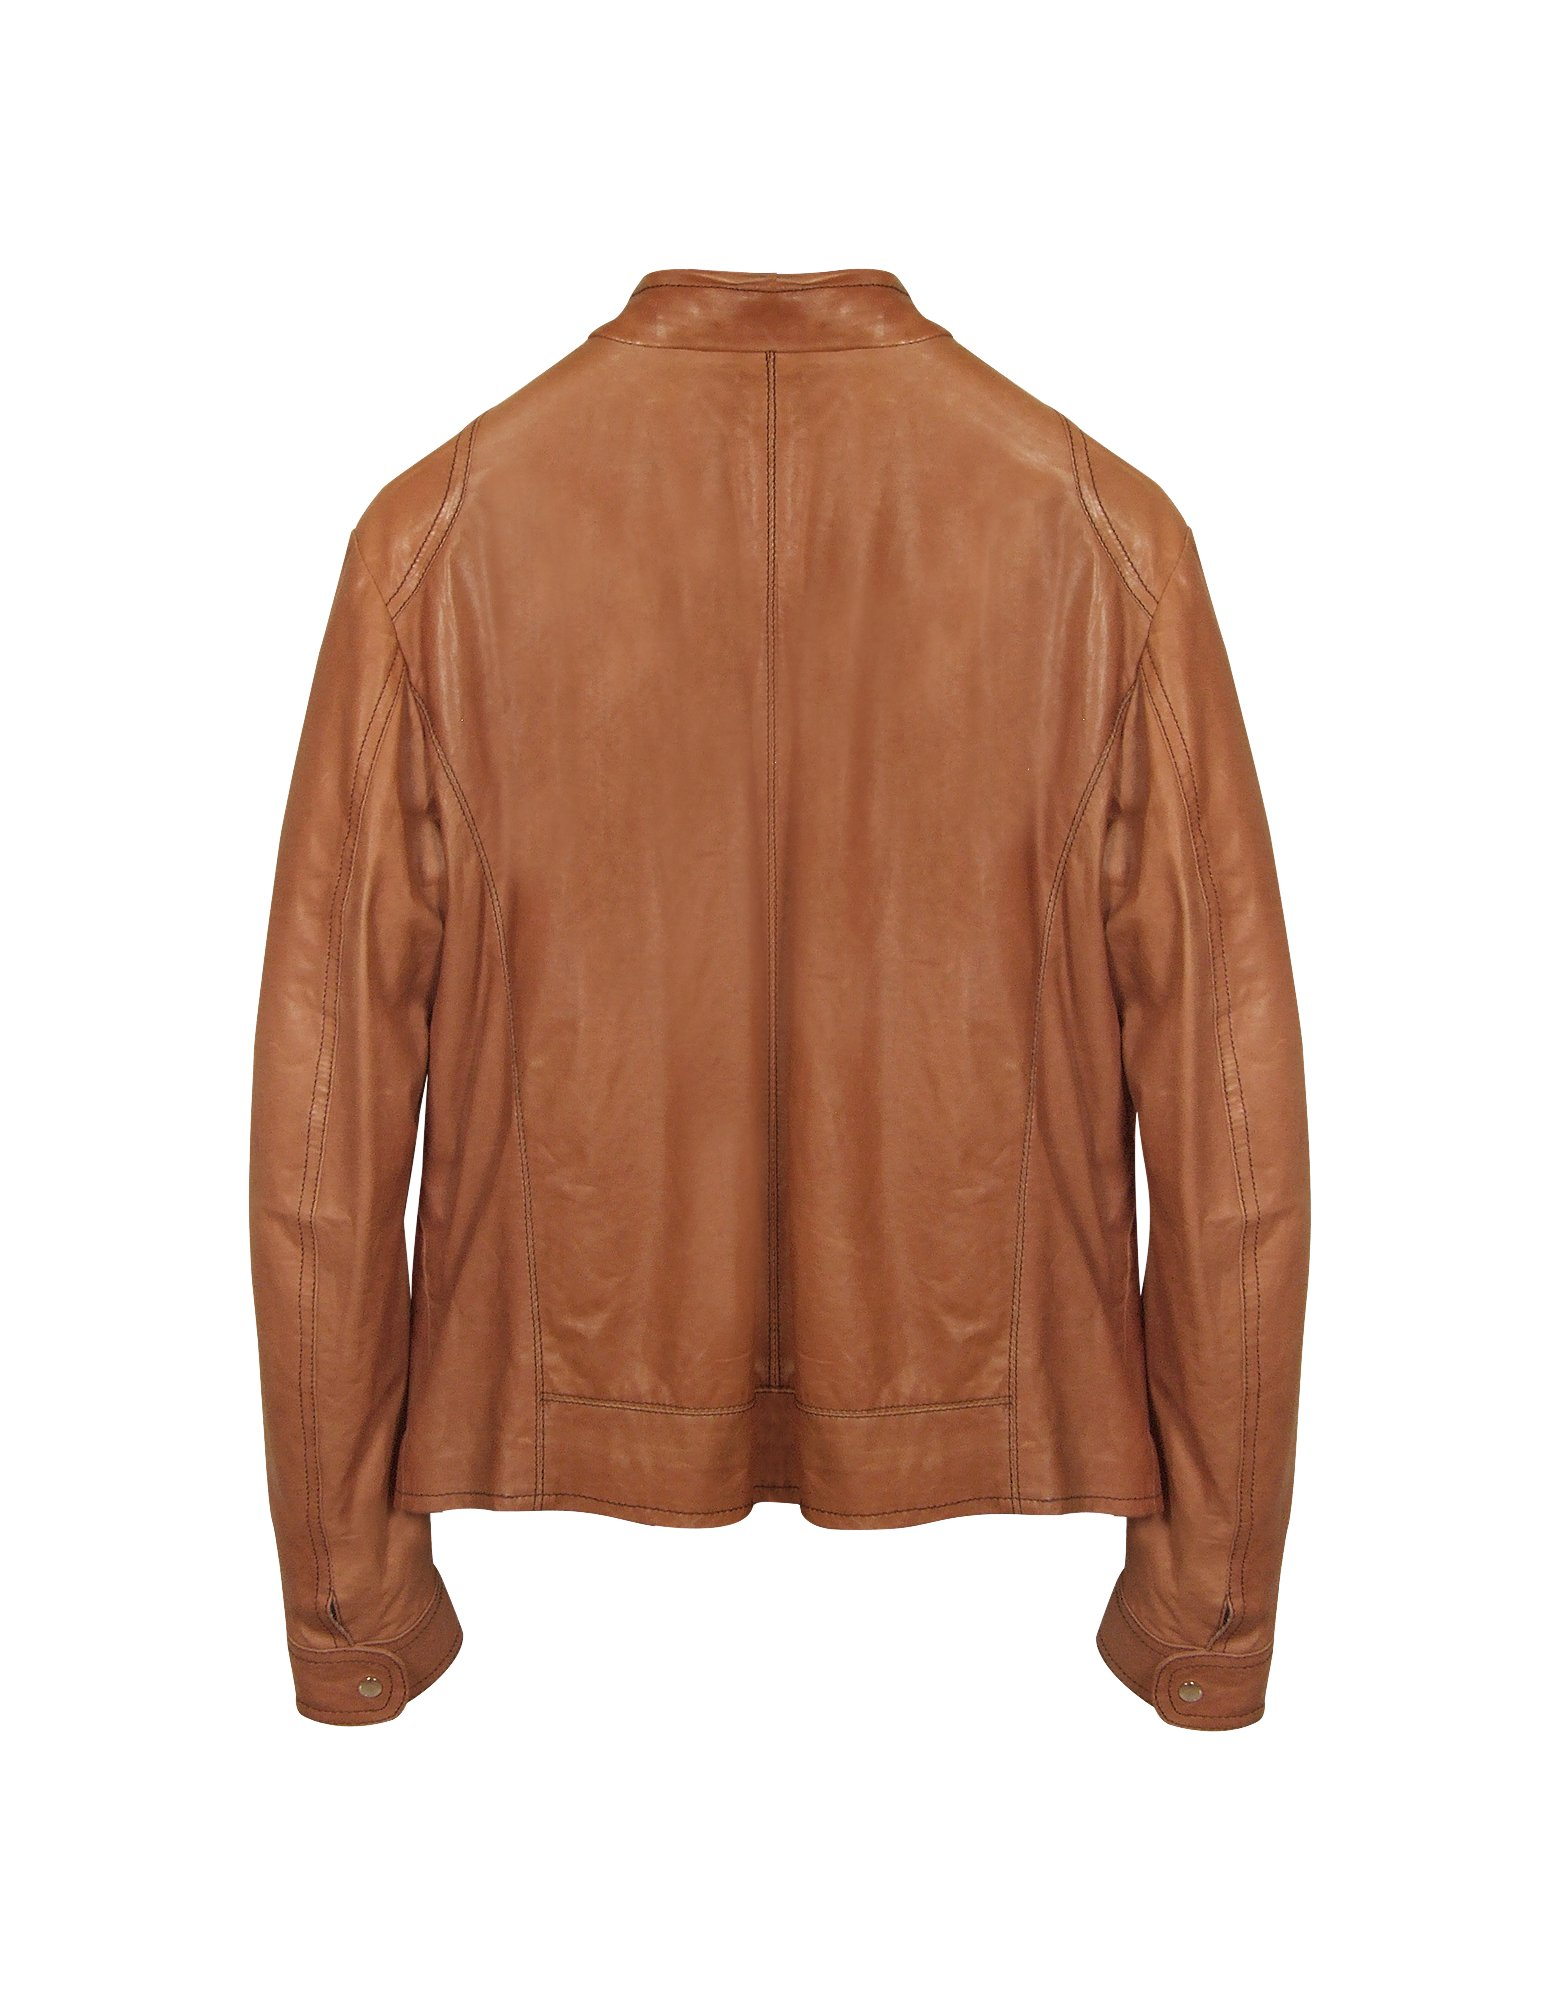 Leather jacket tan